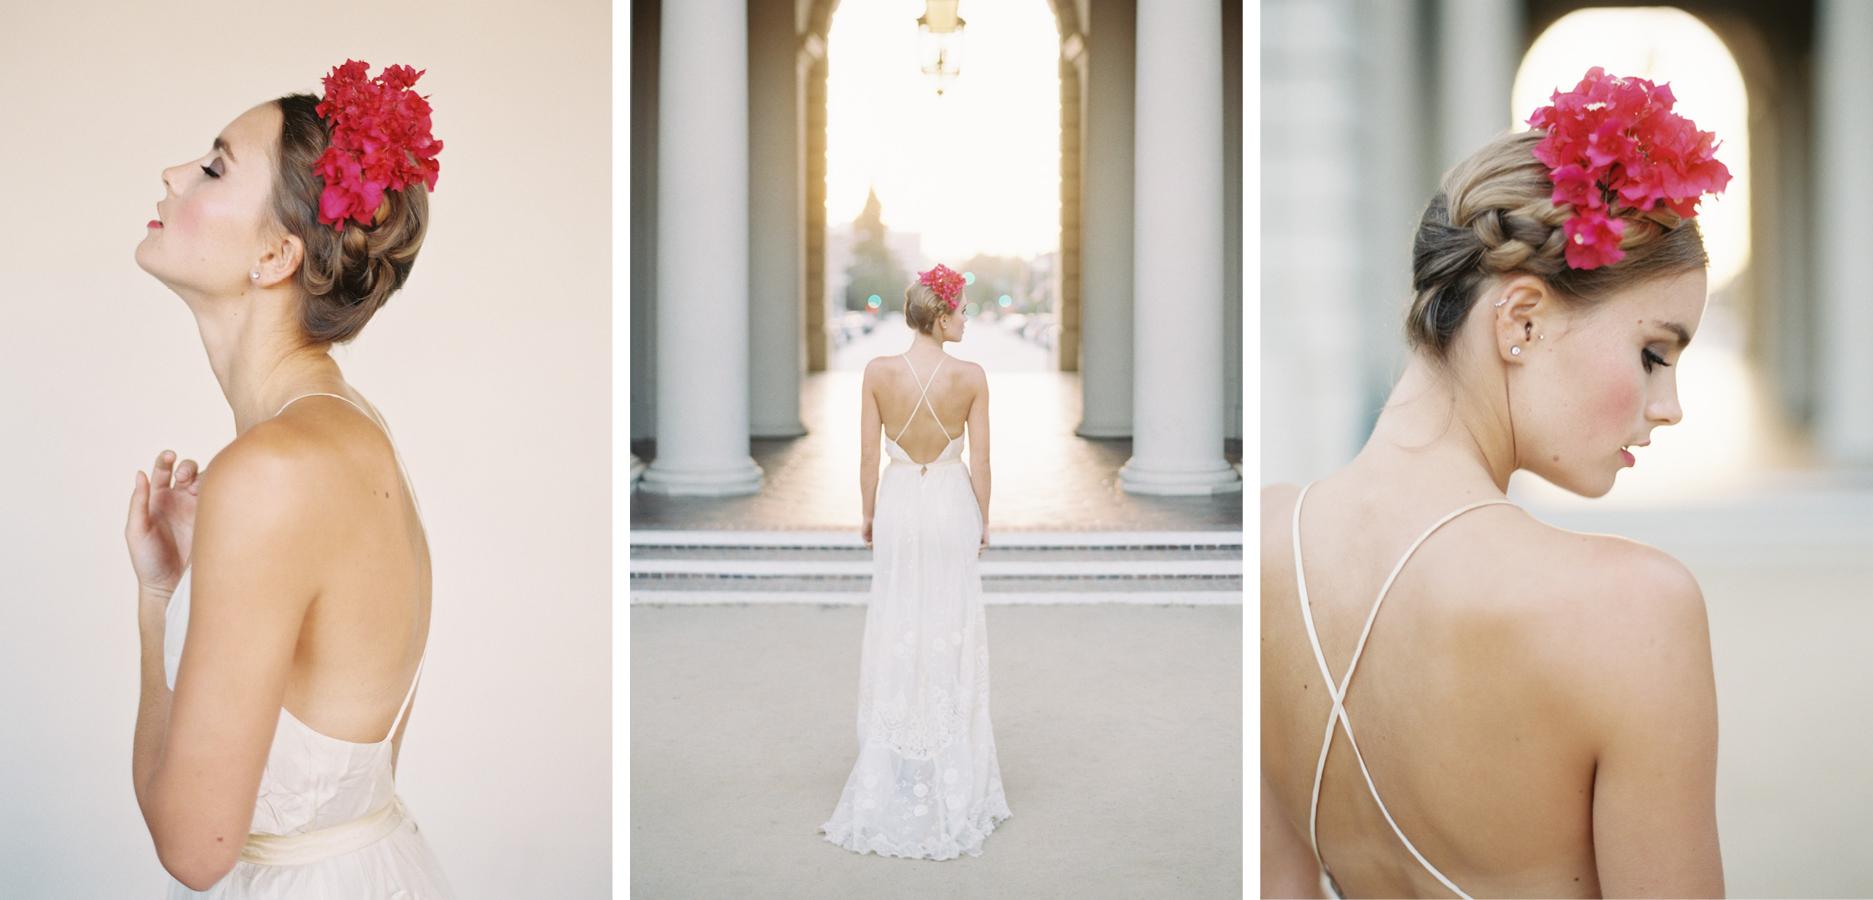 Jess-Wilcox-Hair-Makeup-Wedding-Homepage_2.jpg